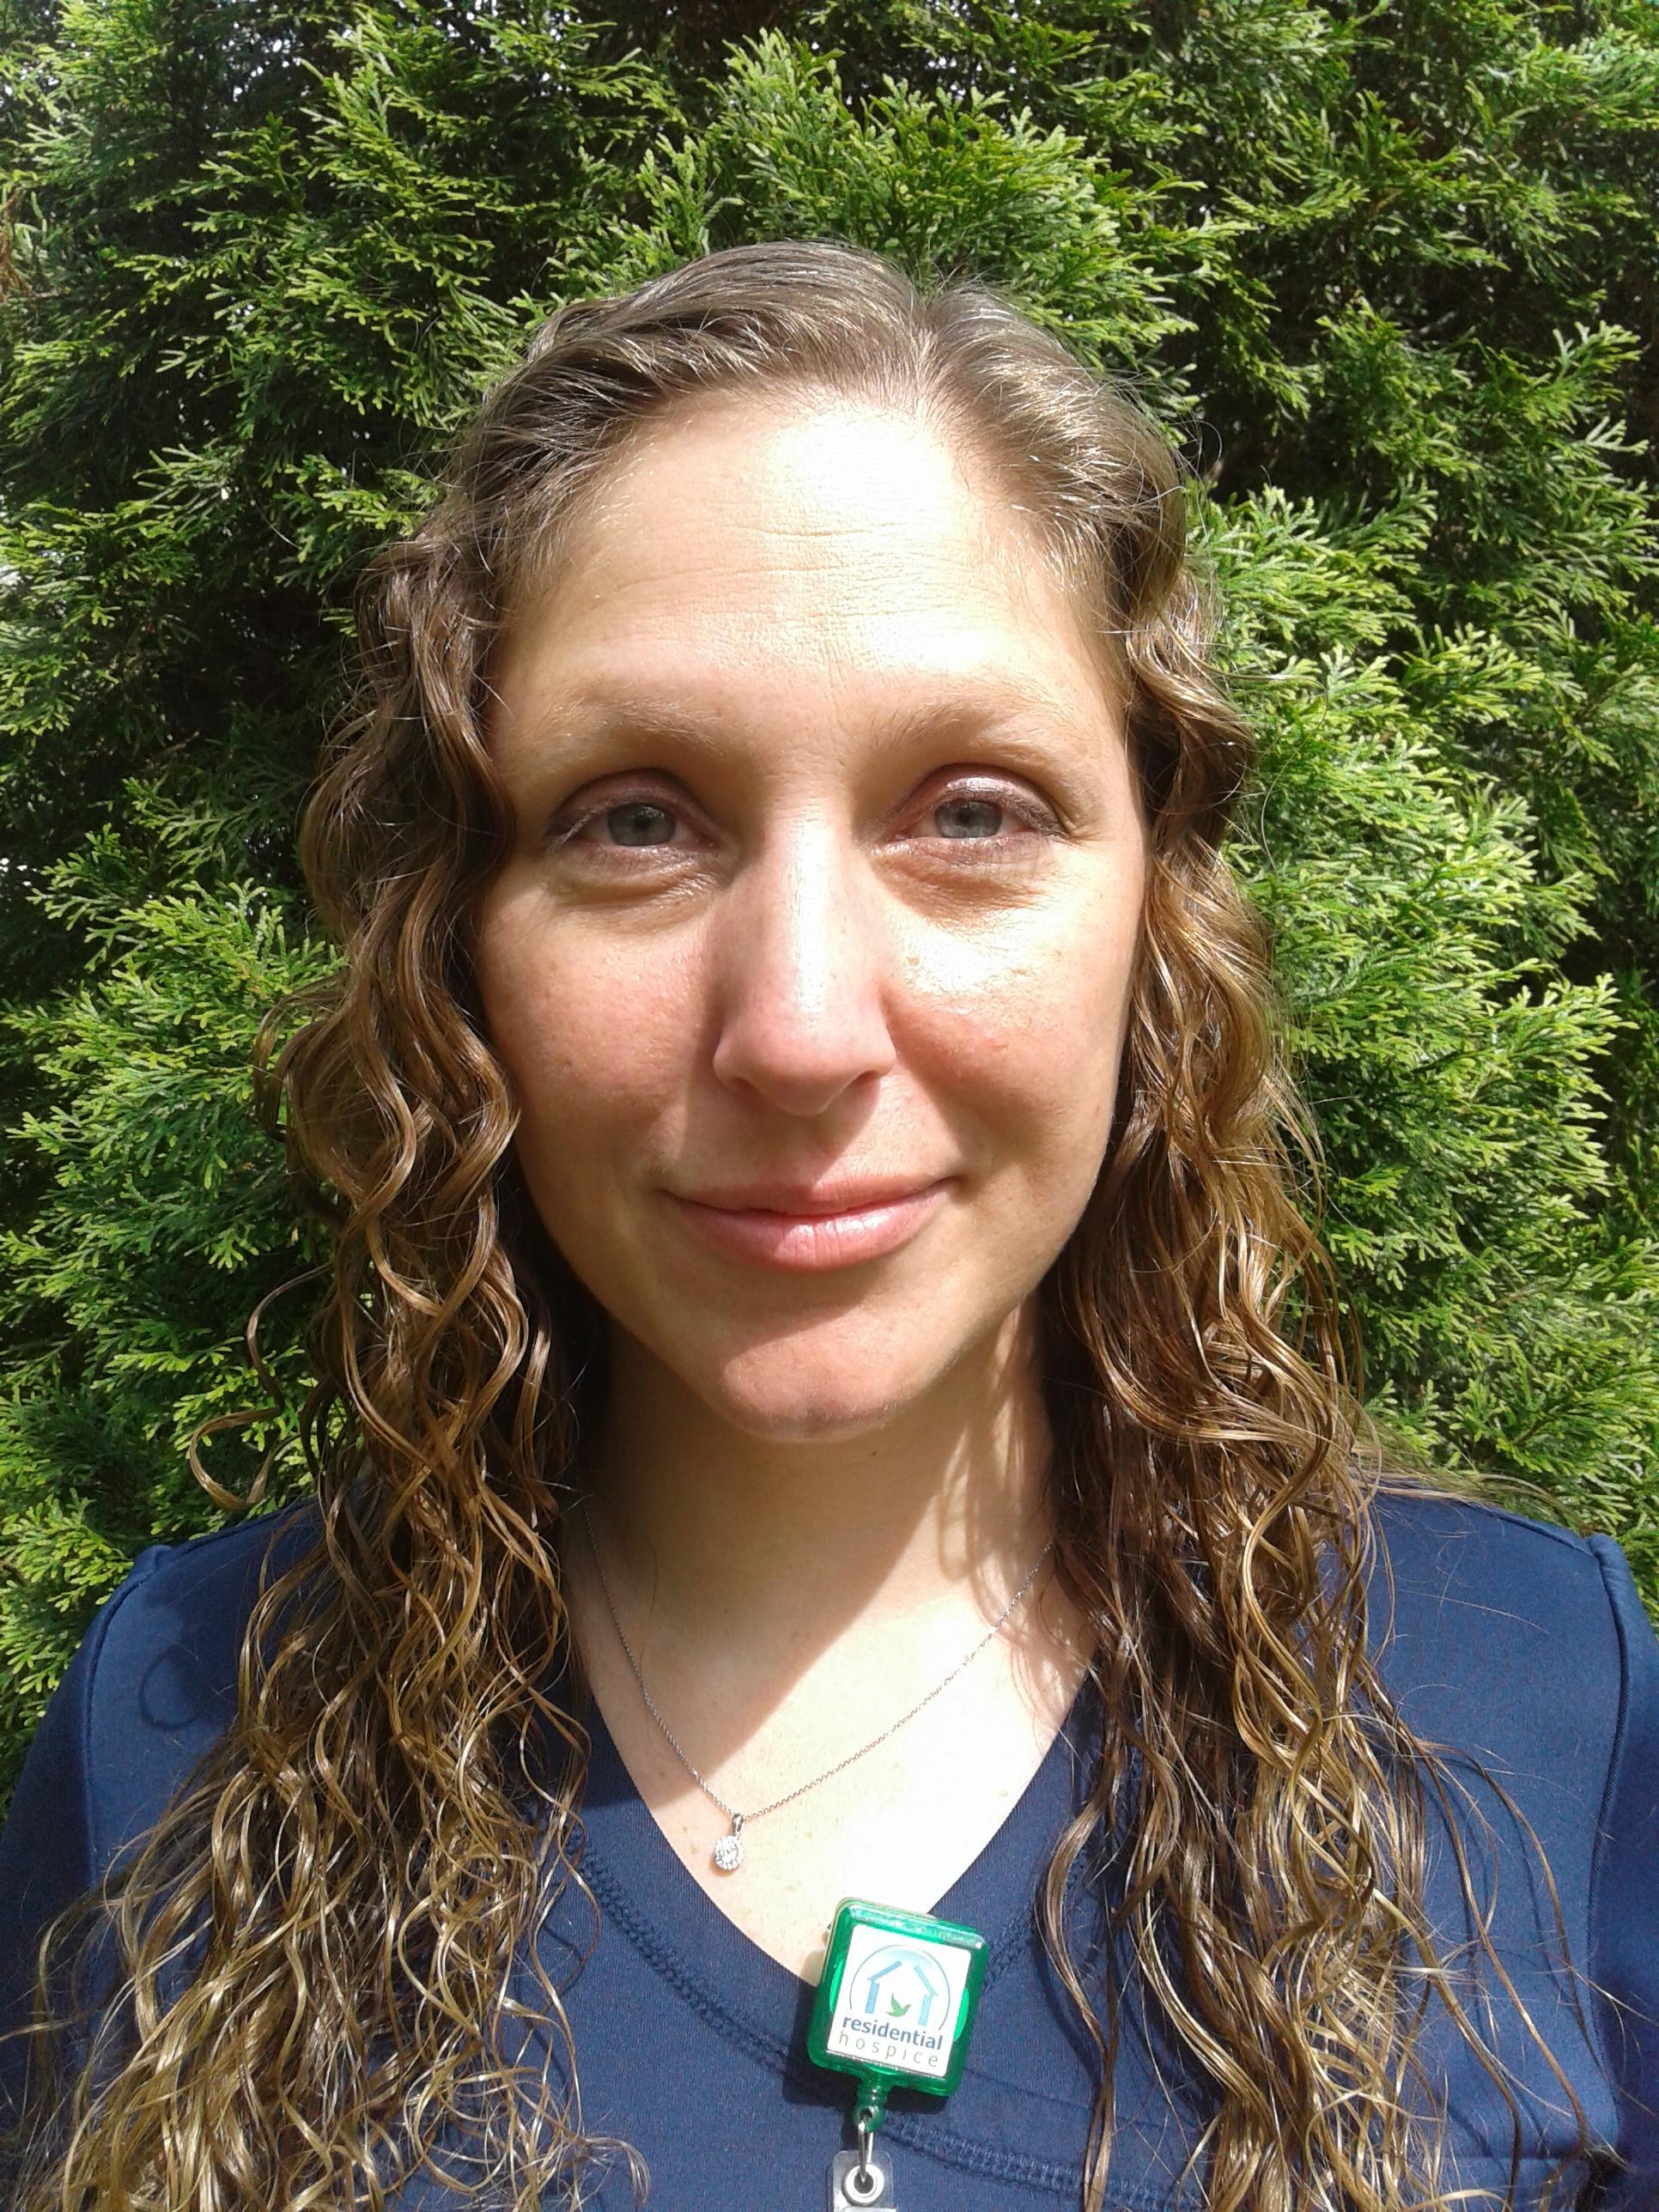 Together as One Nurse Profile of Hospice Nurse KCinnamon Dowling